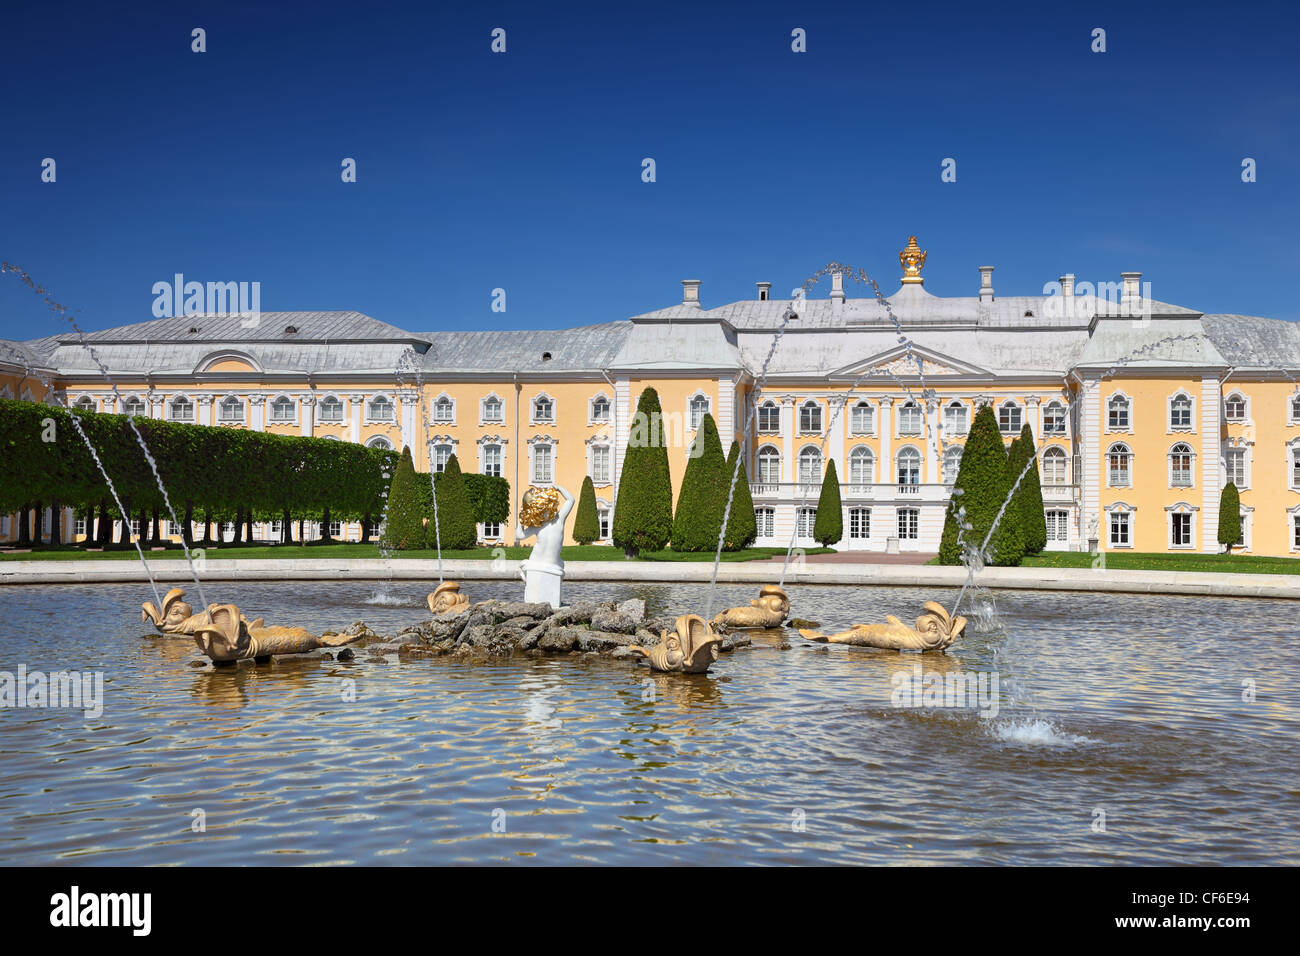 Grand Palace and fountain Oak of Peterhof,  Saint-Petersburg, Russia - Stock Image